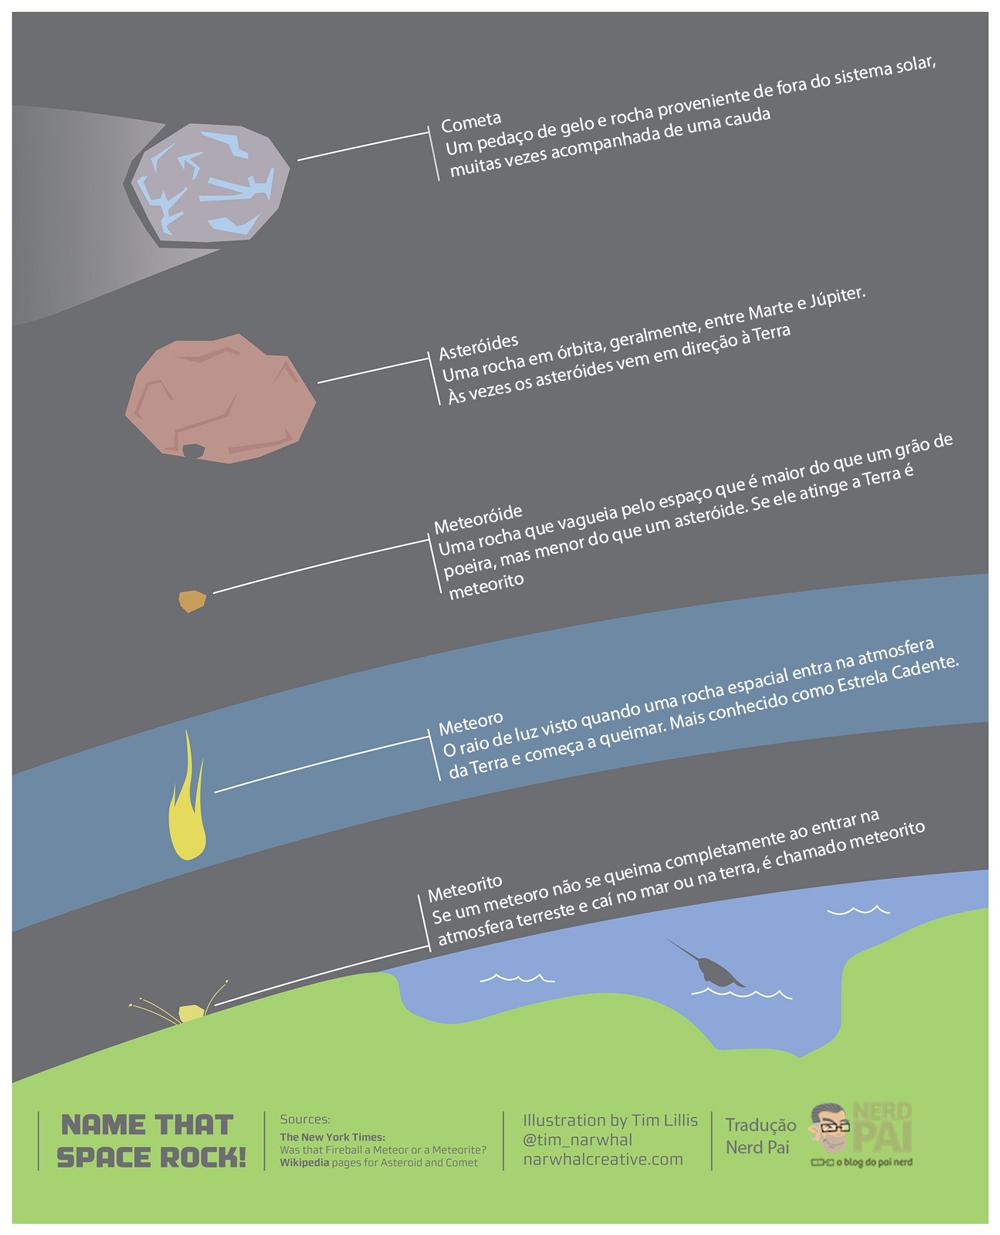 cometa-meteoro-meteorito